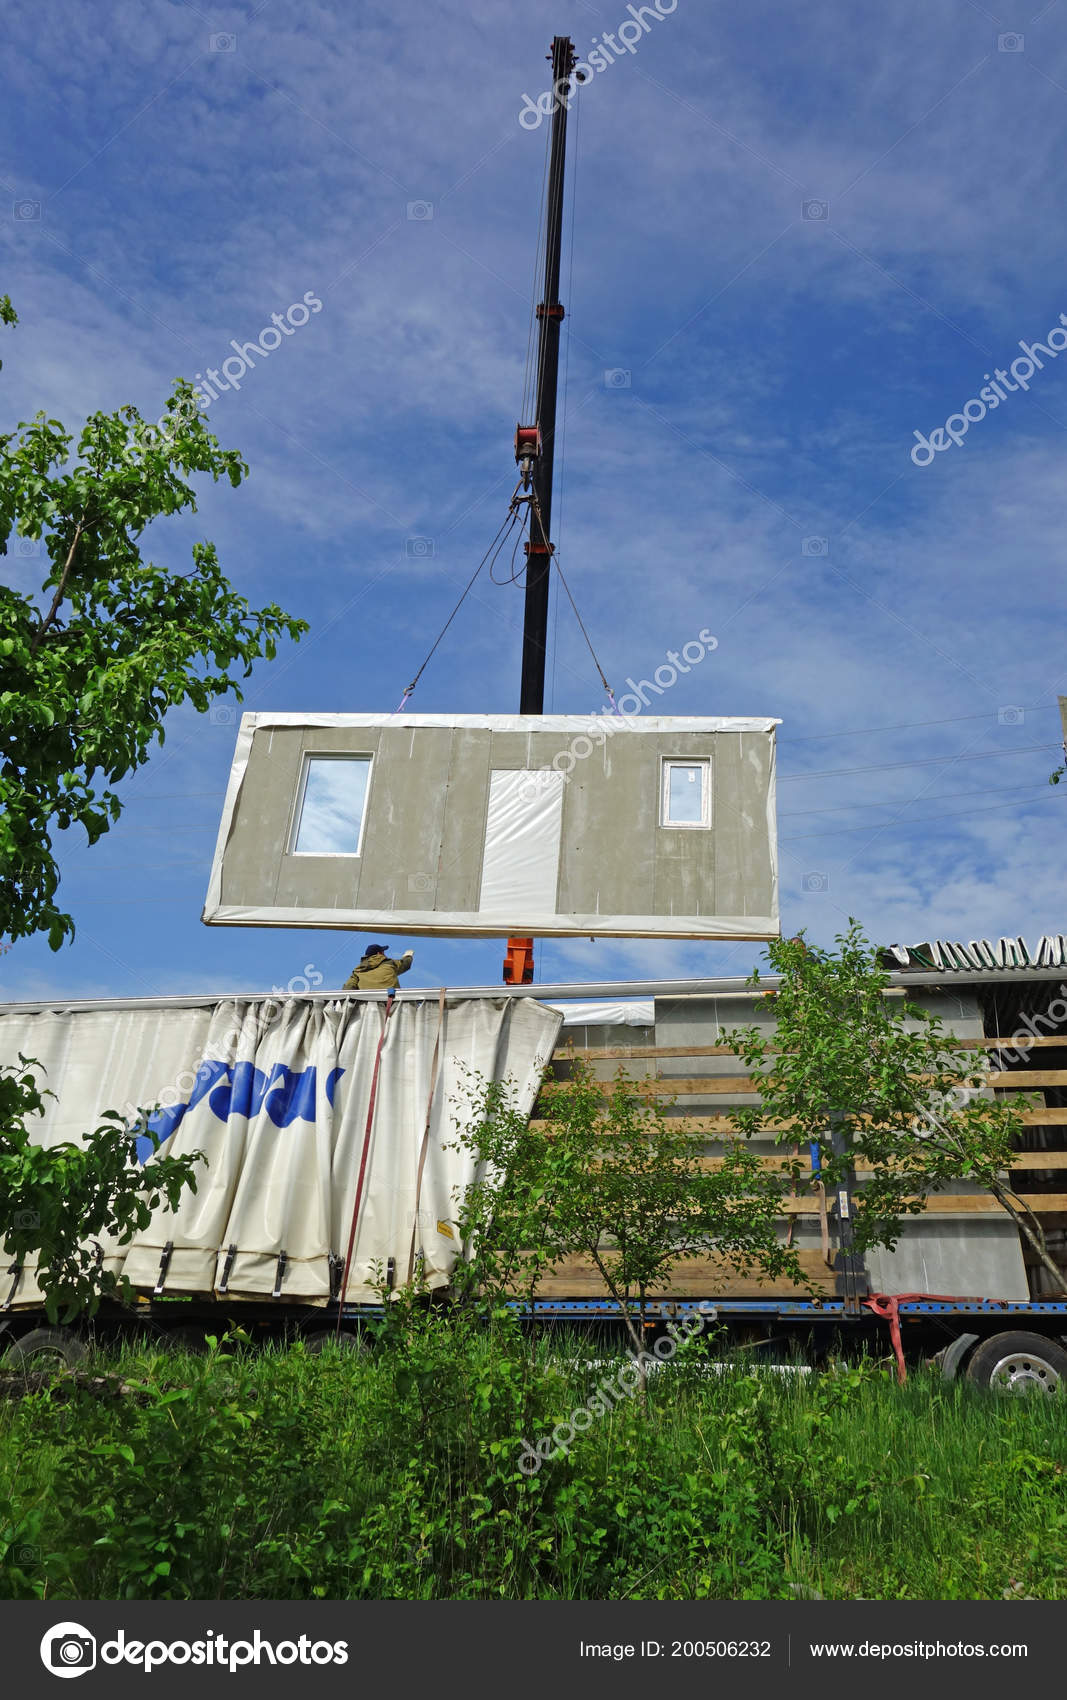 Mobile Crane Lifts Wall Panel Home Stock Photo Ra3rn 200506232